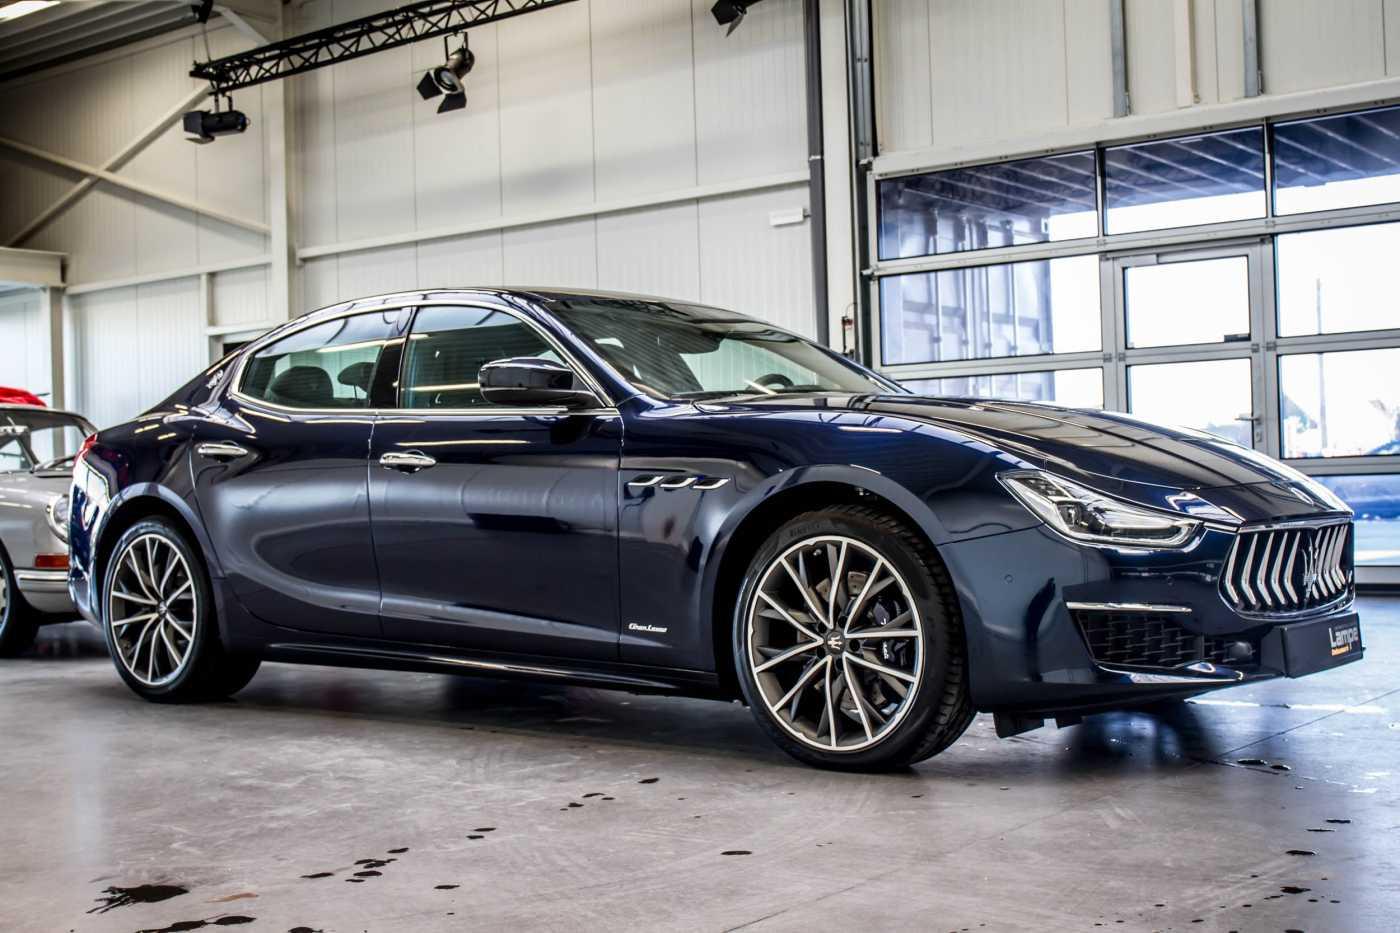 Maserati Ghibli Diesel GranLusso Keyless Sports Exhaust LED Camera 2/29